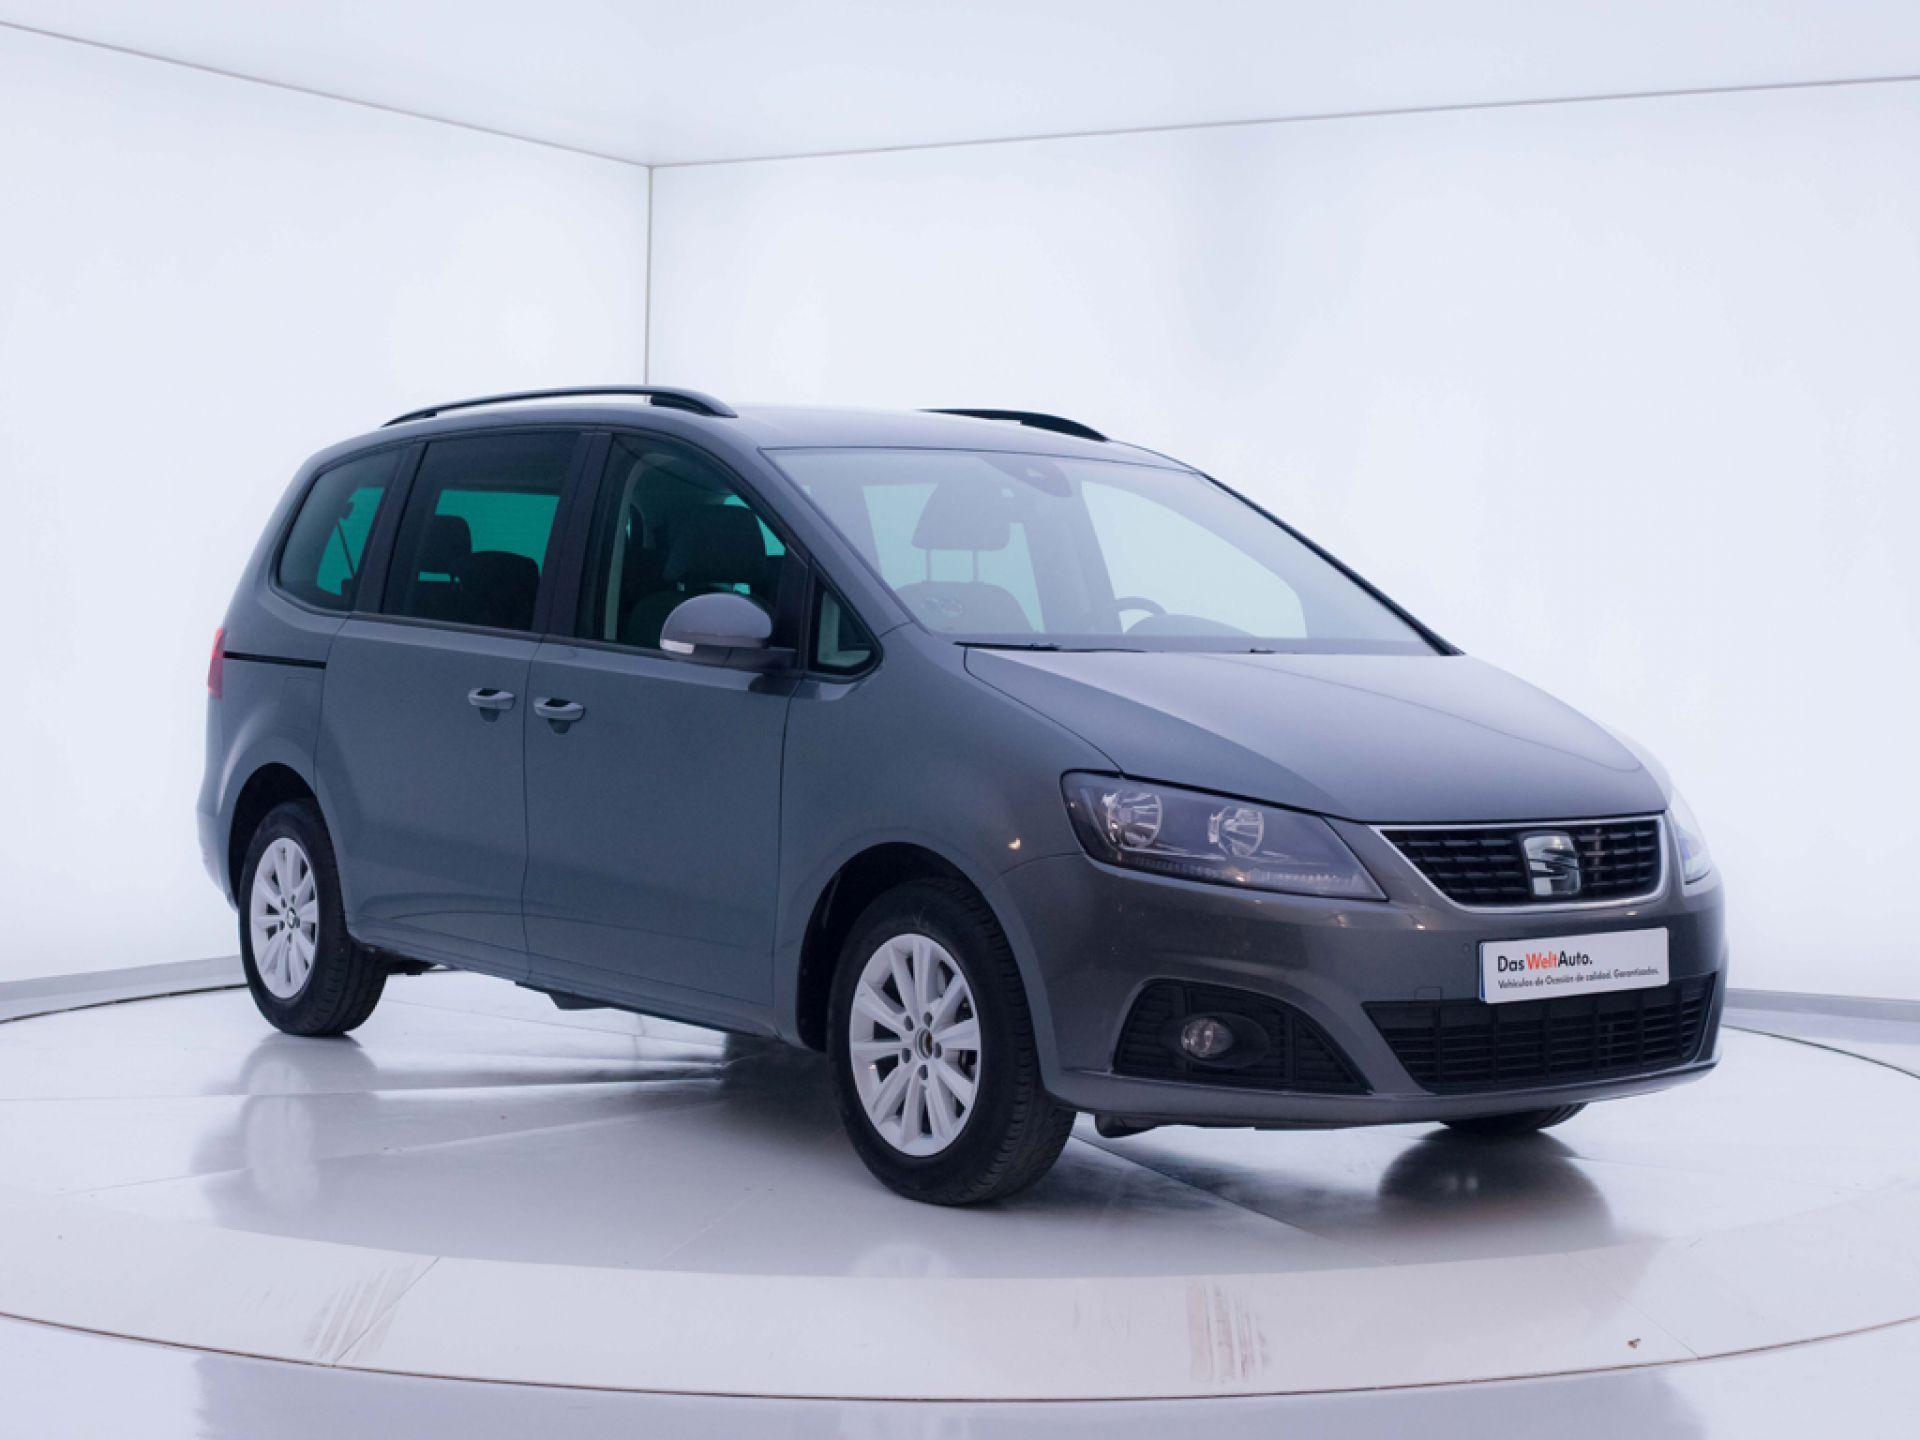 SEAT Alhambra 2.0 TDI (150CV) Eco S/S Reference